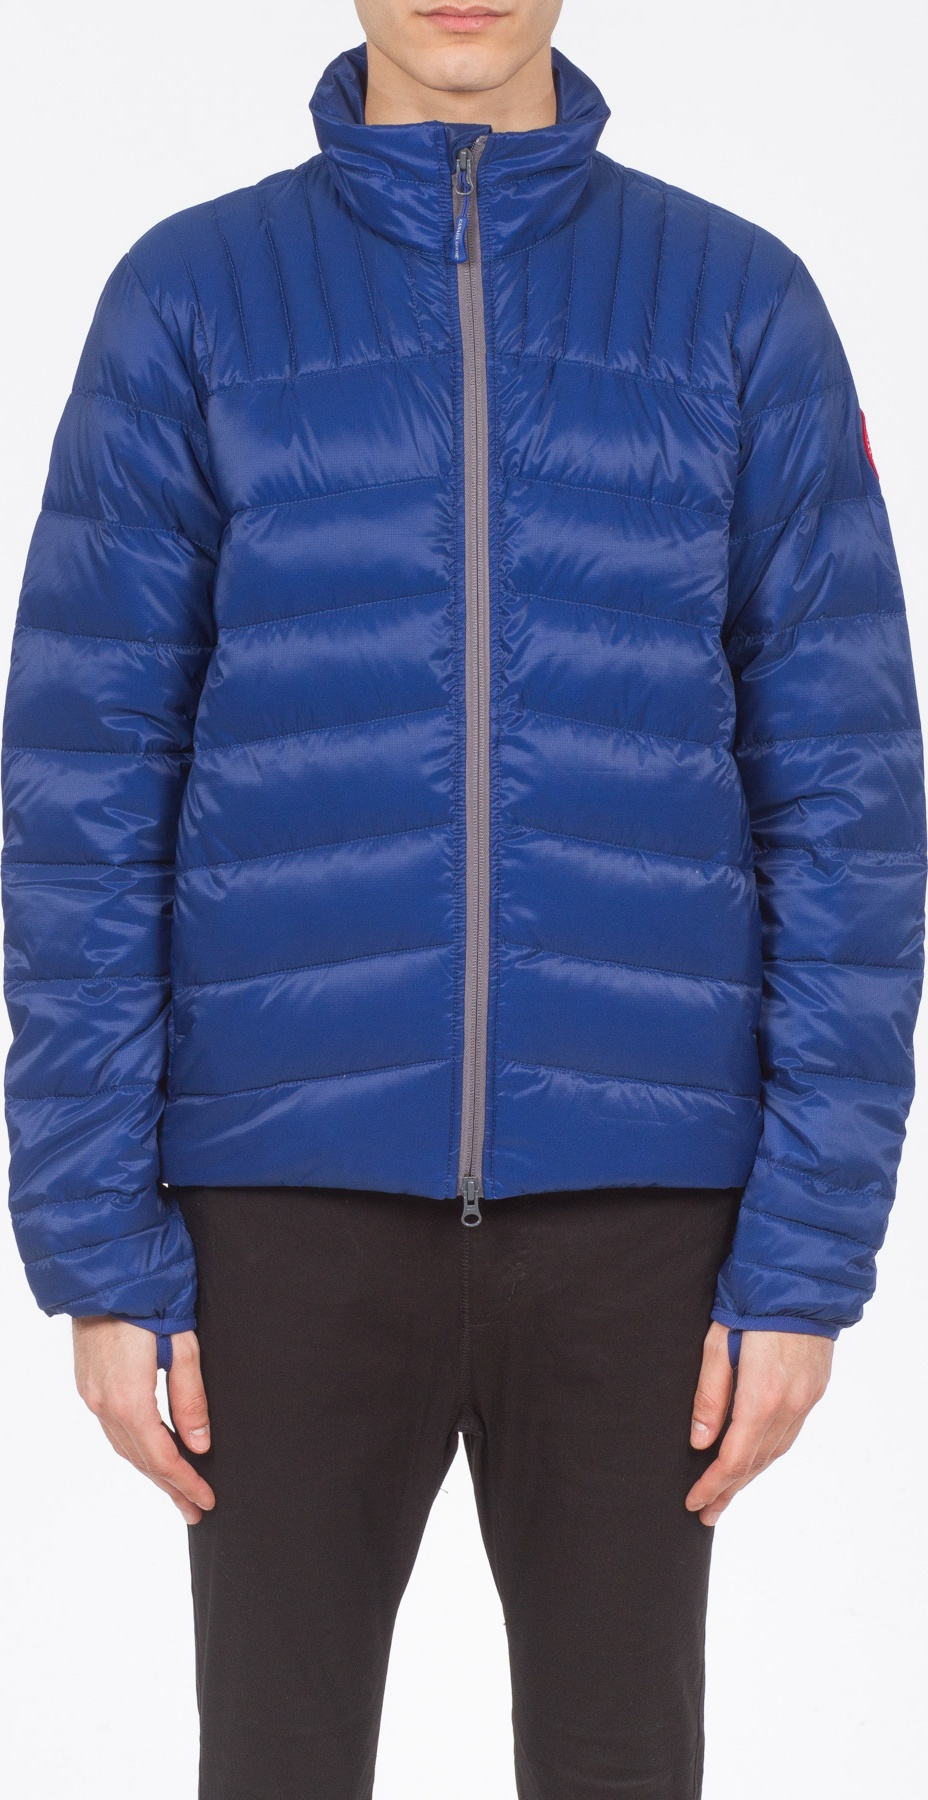 canada goose hybridge jacket pacific blue